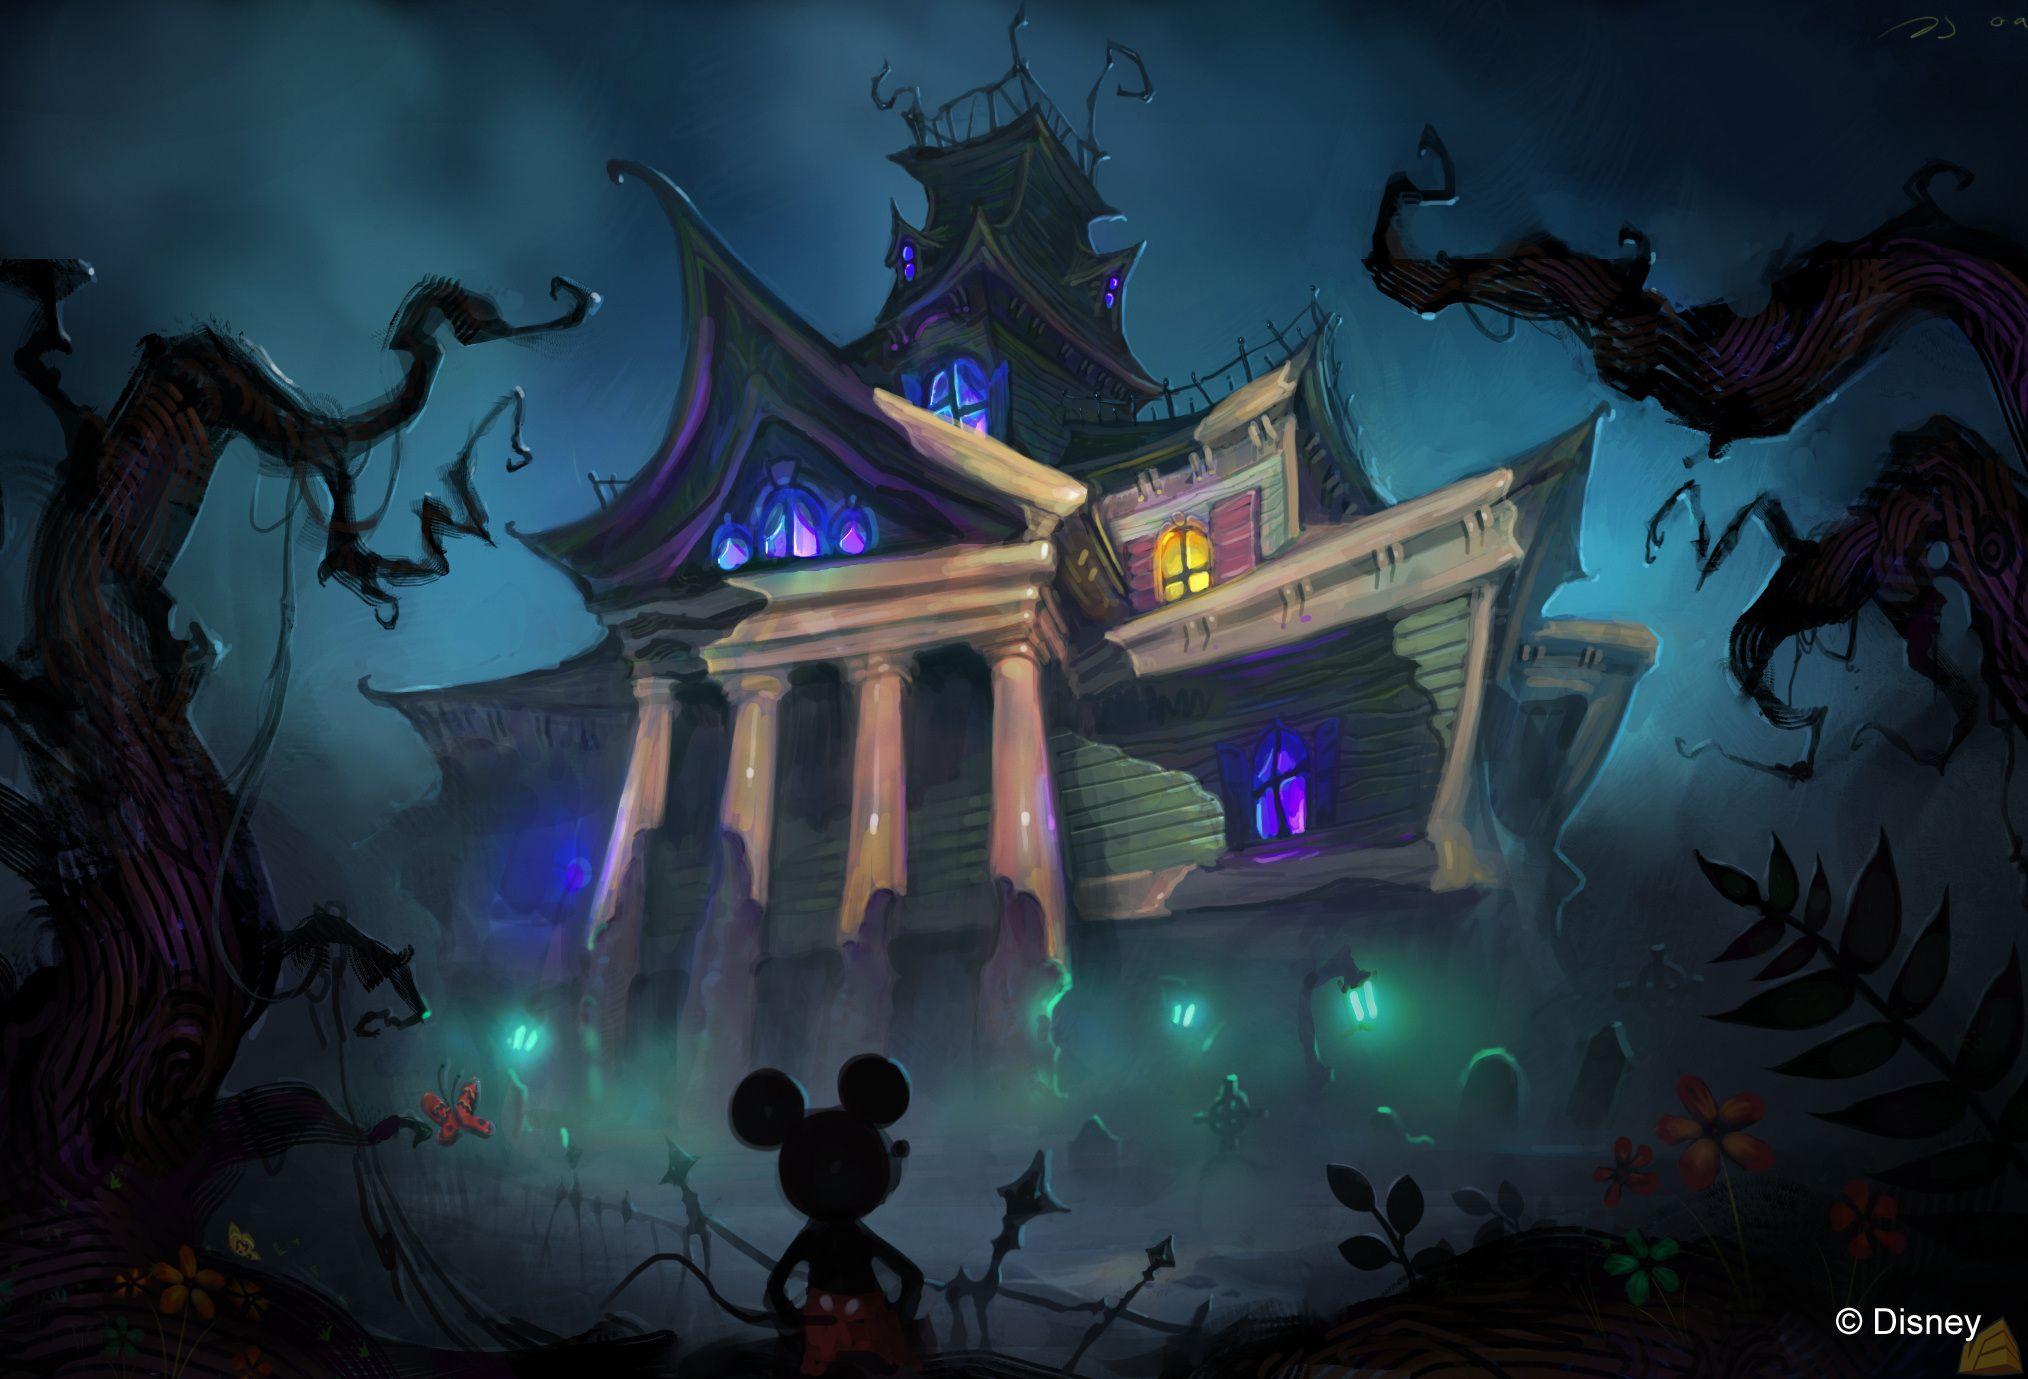 Mickey Mouse Creepy Dark Halloween Disney Haunted Wallpaper